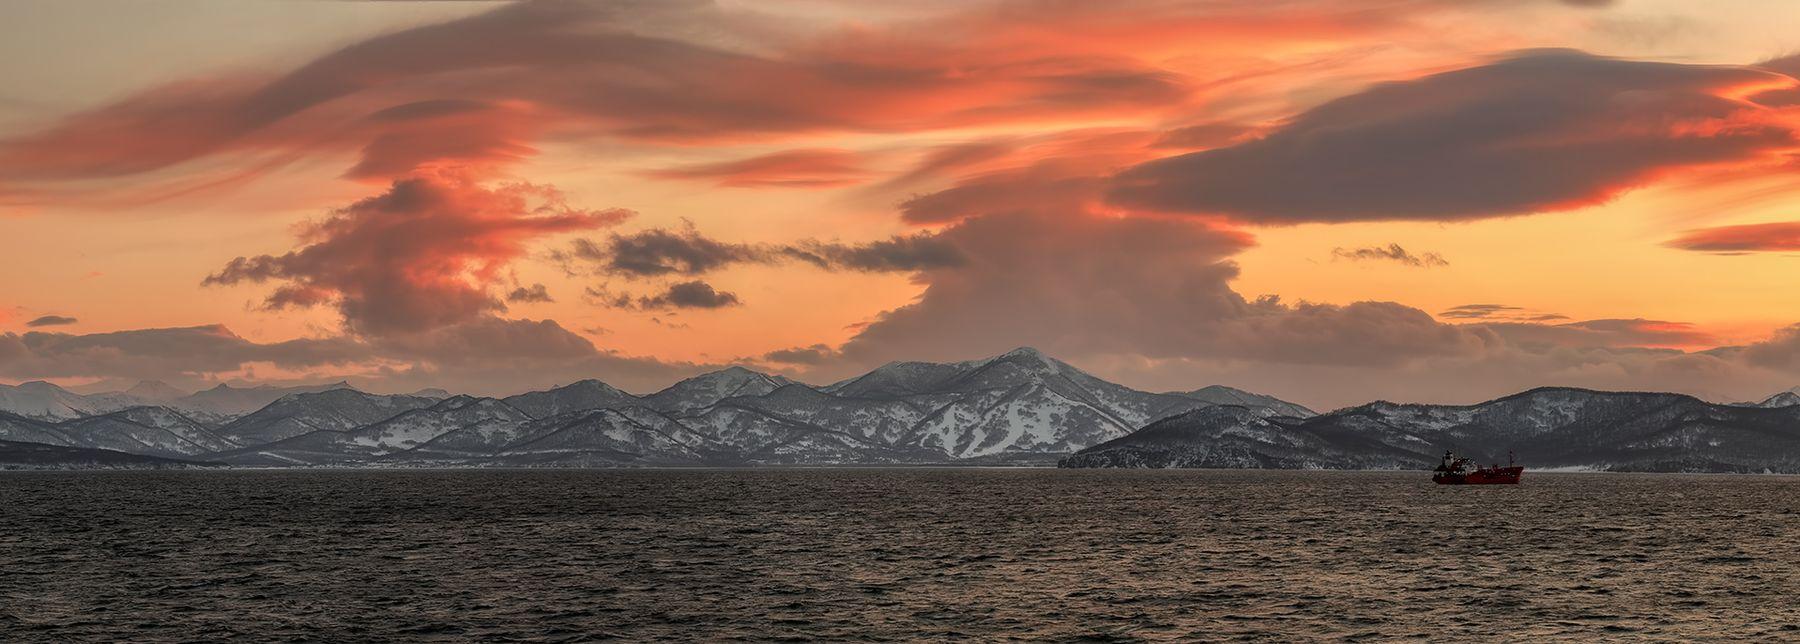 абракадабра..)) берег весна вечер Камчатка рейд судно тучи